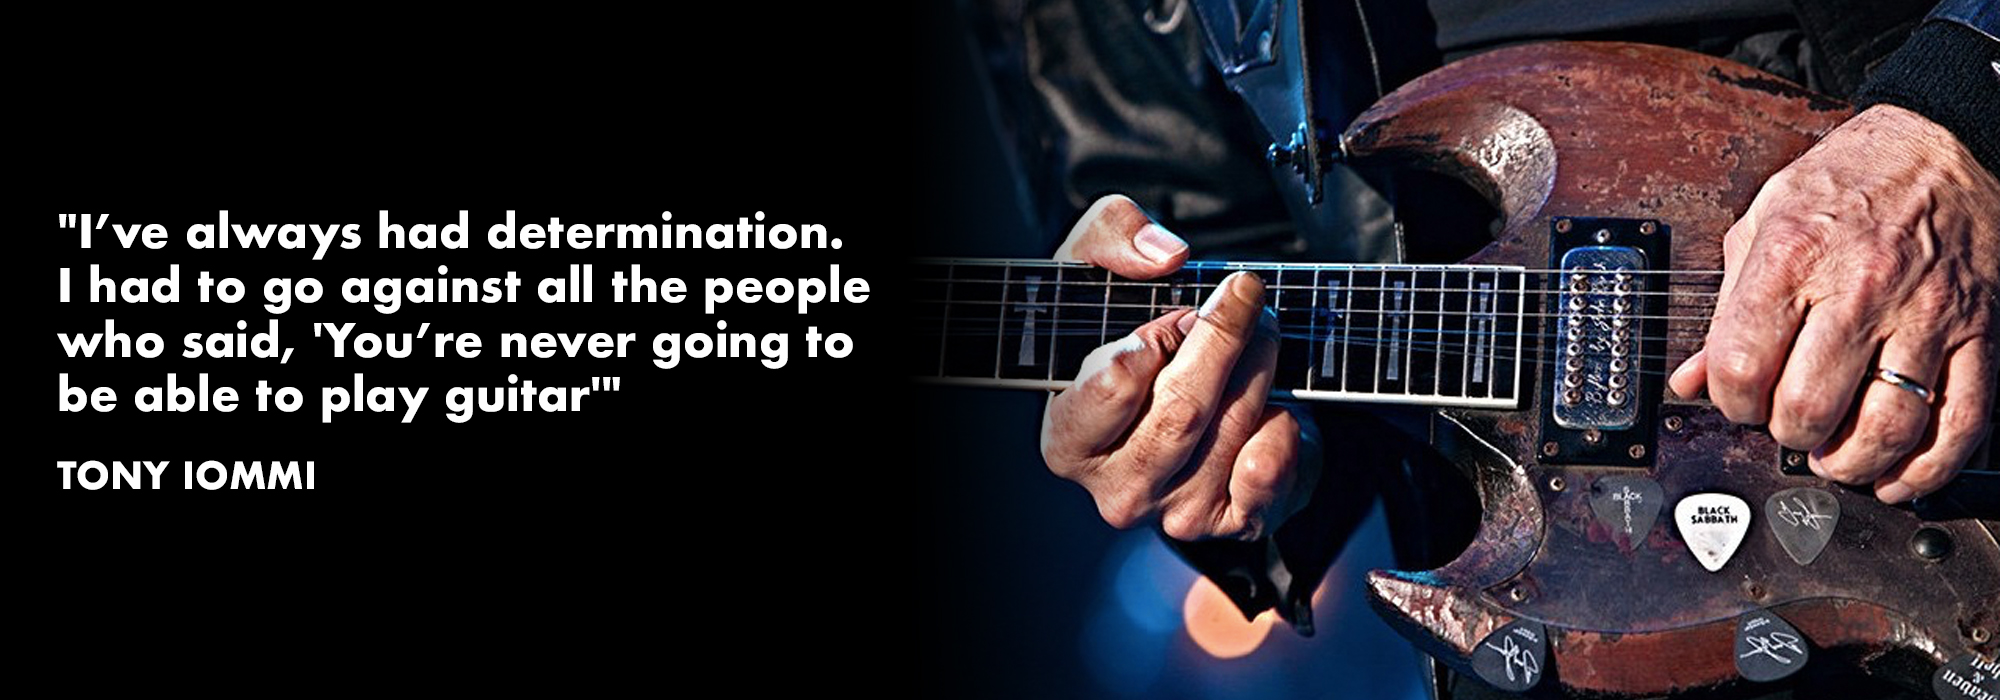 Quote from Tony Iommi of Black Sabbath